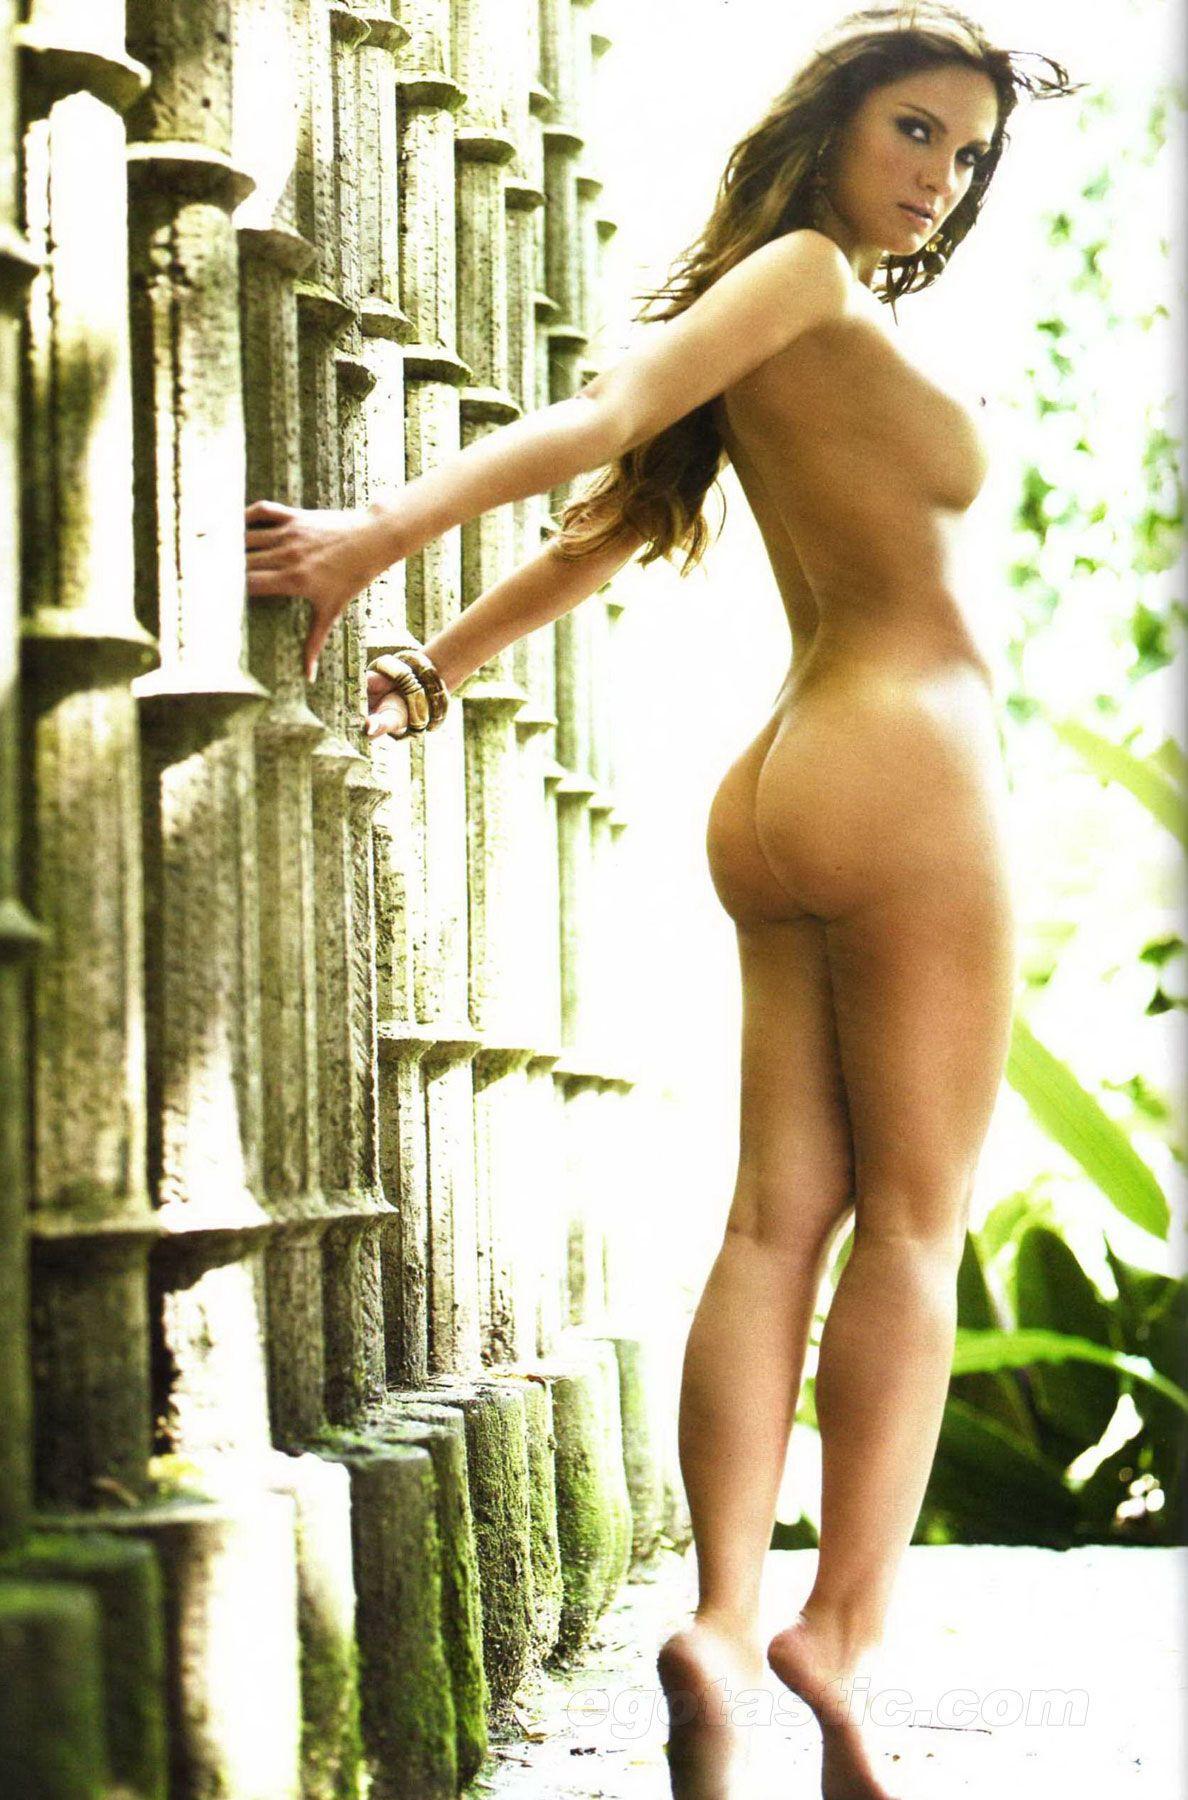 Boy Nude Photographs